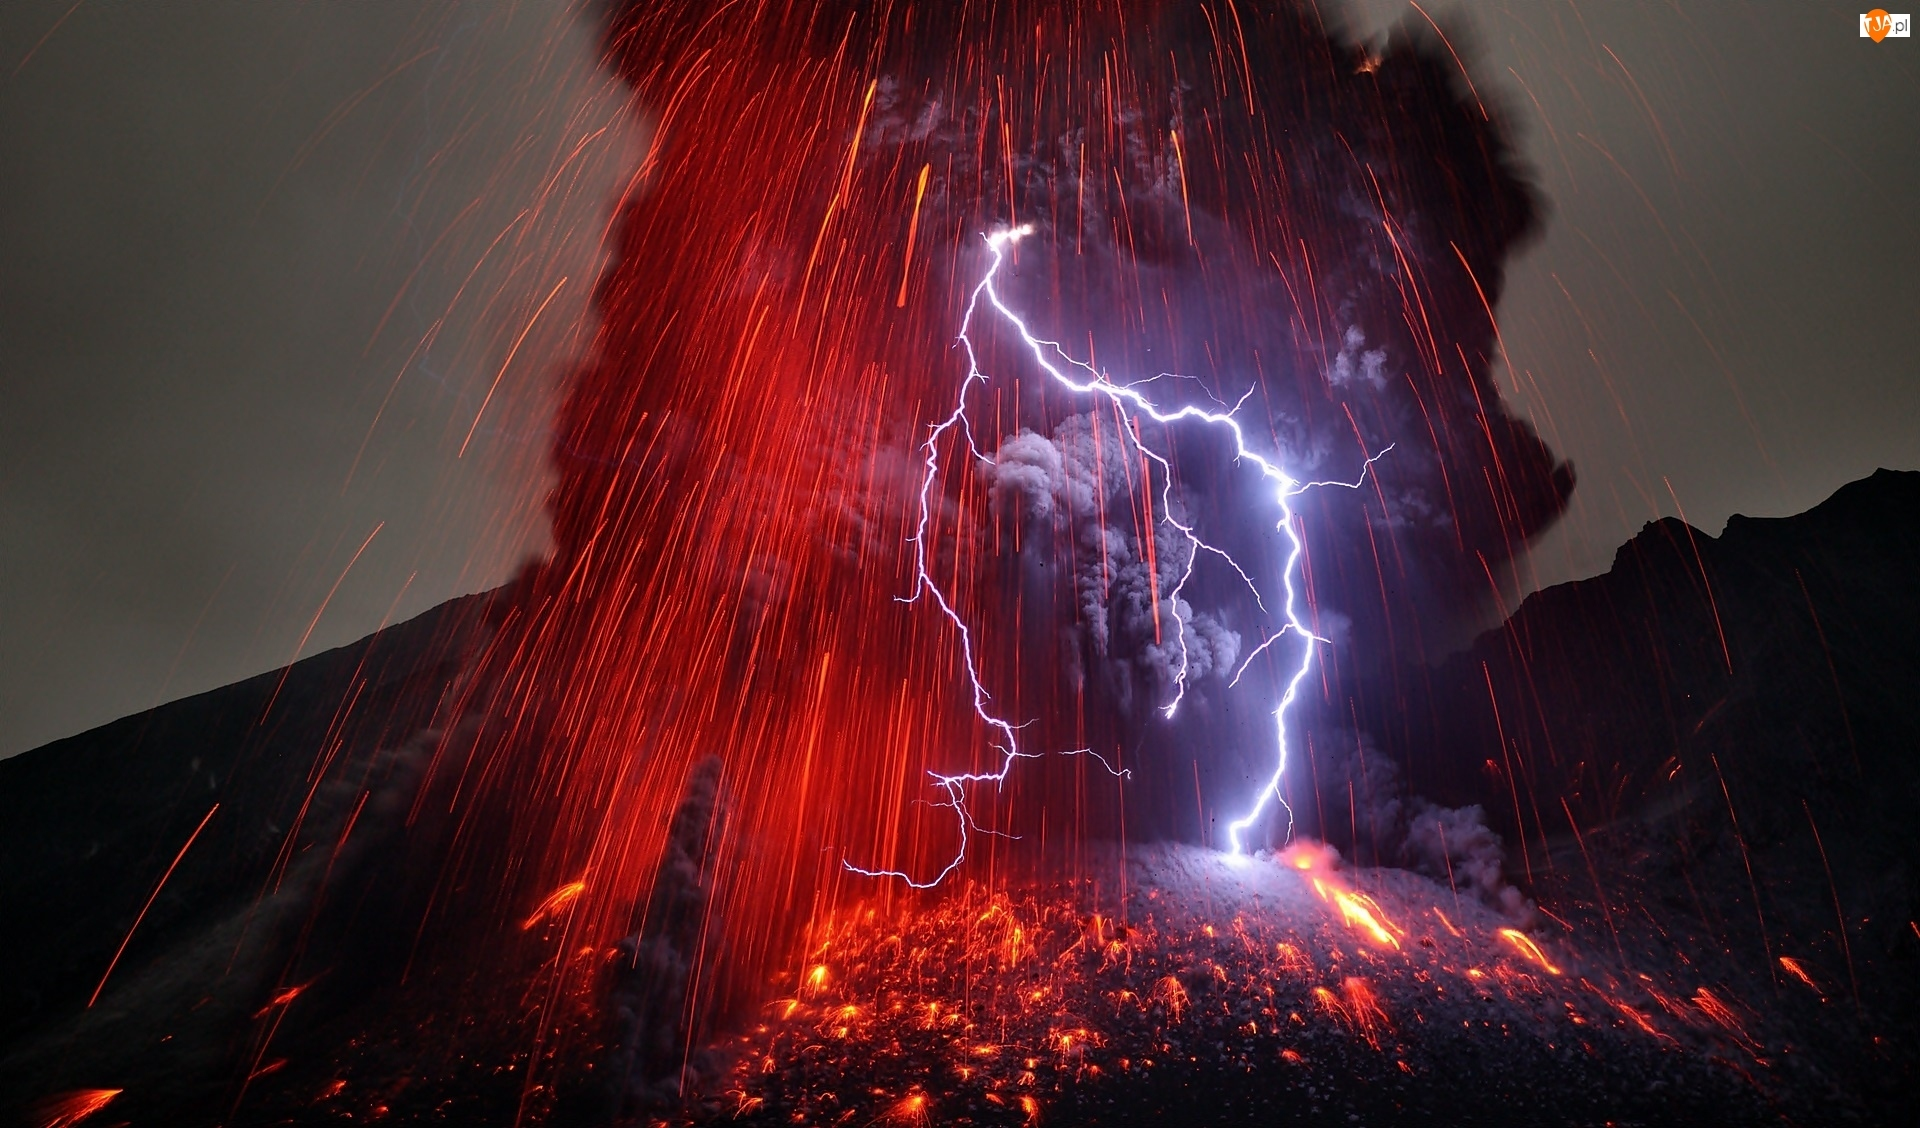 Burza, Wyspa, Erupcja, Kiusiu, Wulkanu Sakurajima